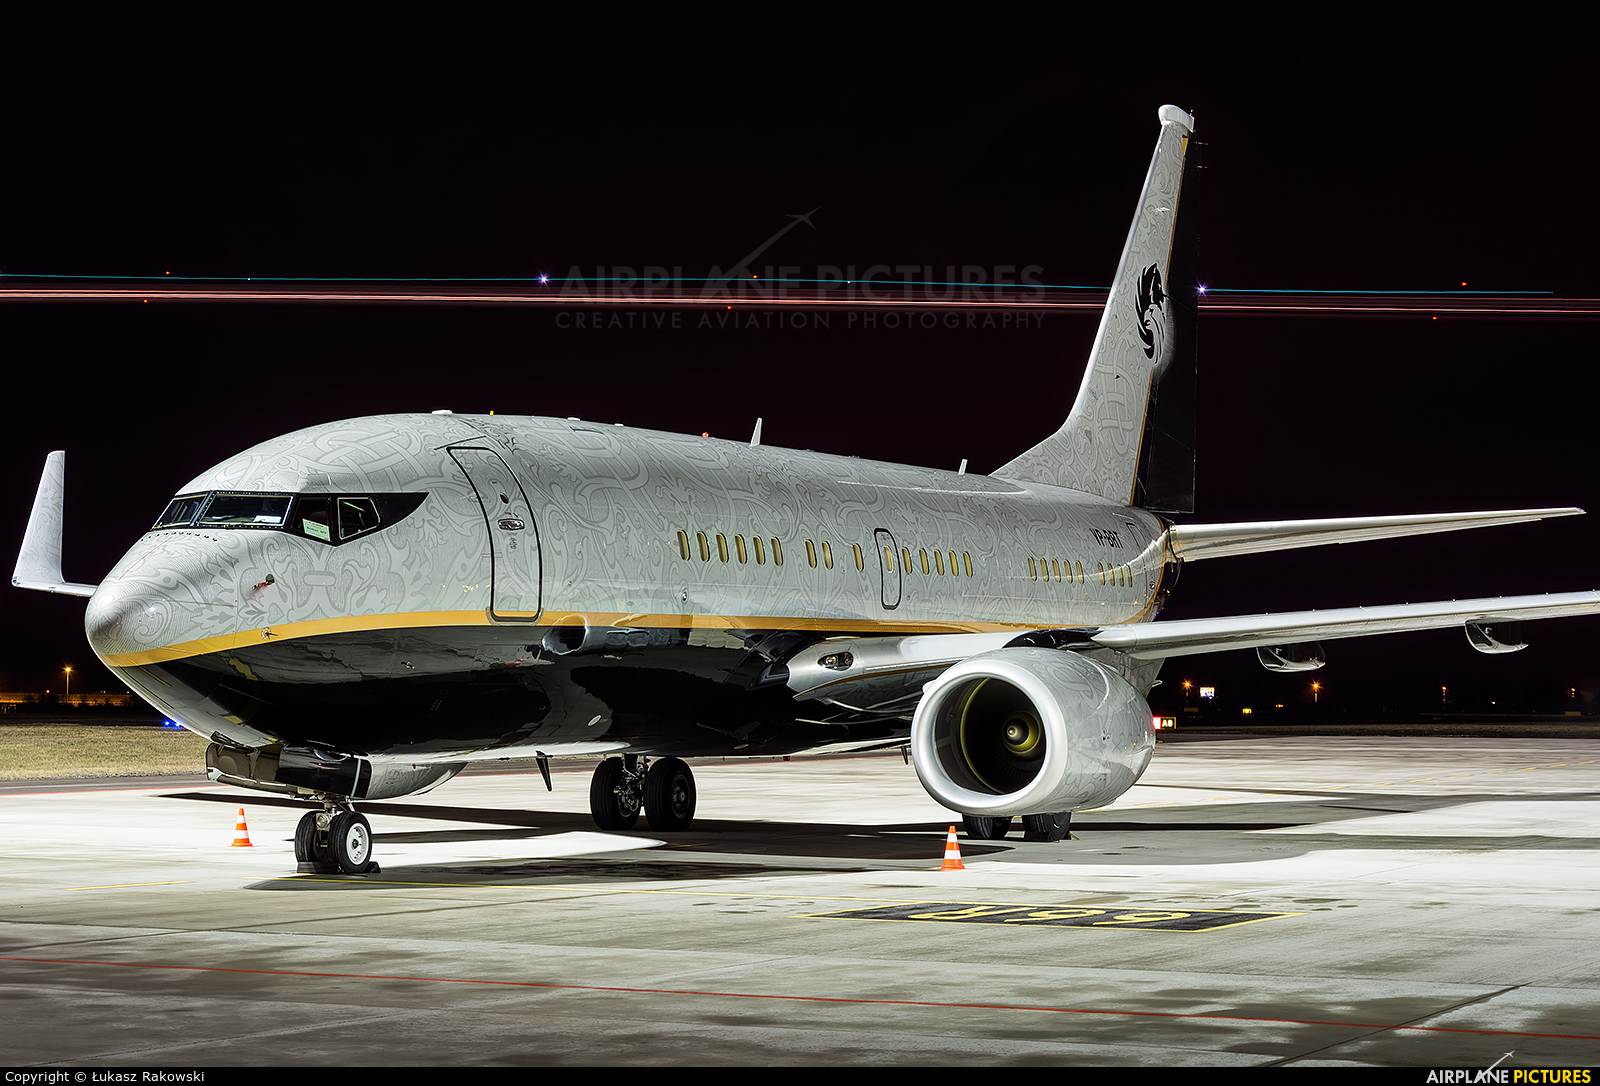 boeing 737 aircraft aviation - photo #43